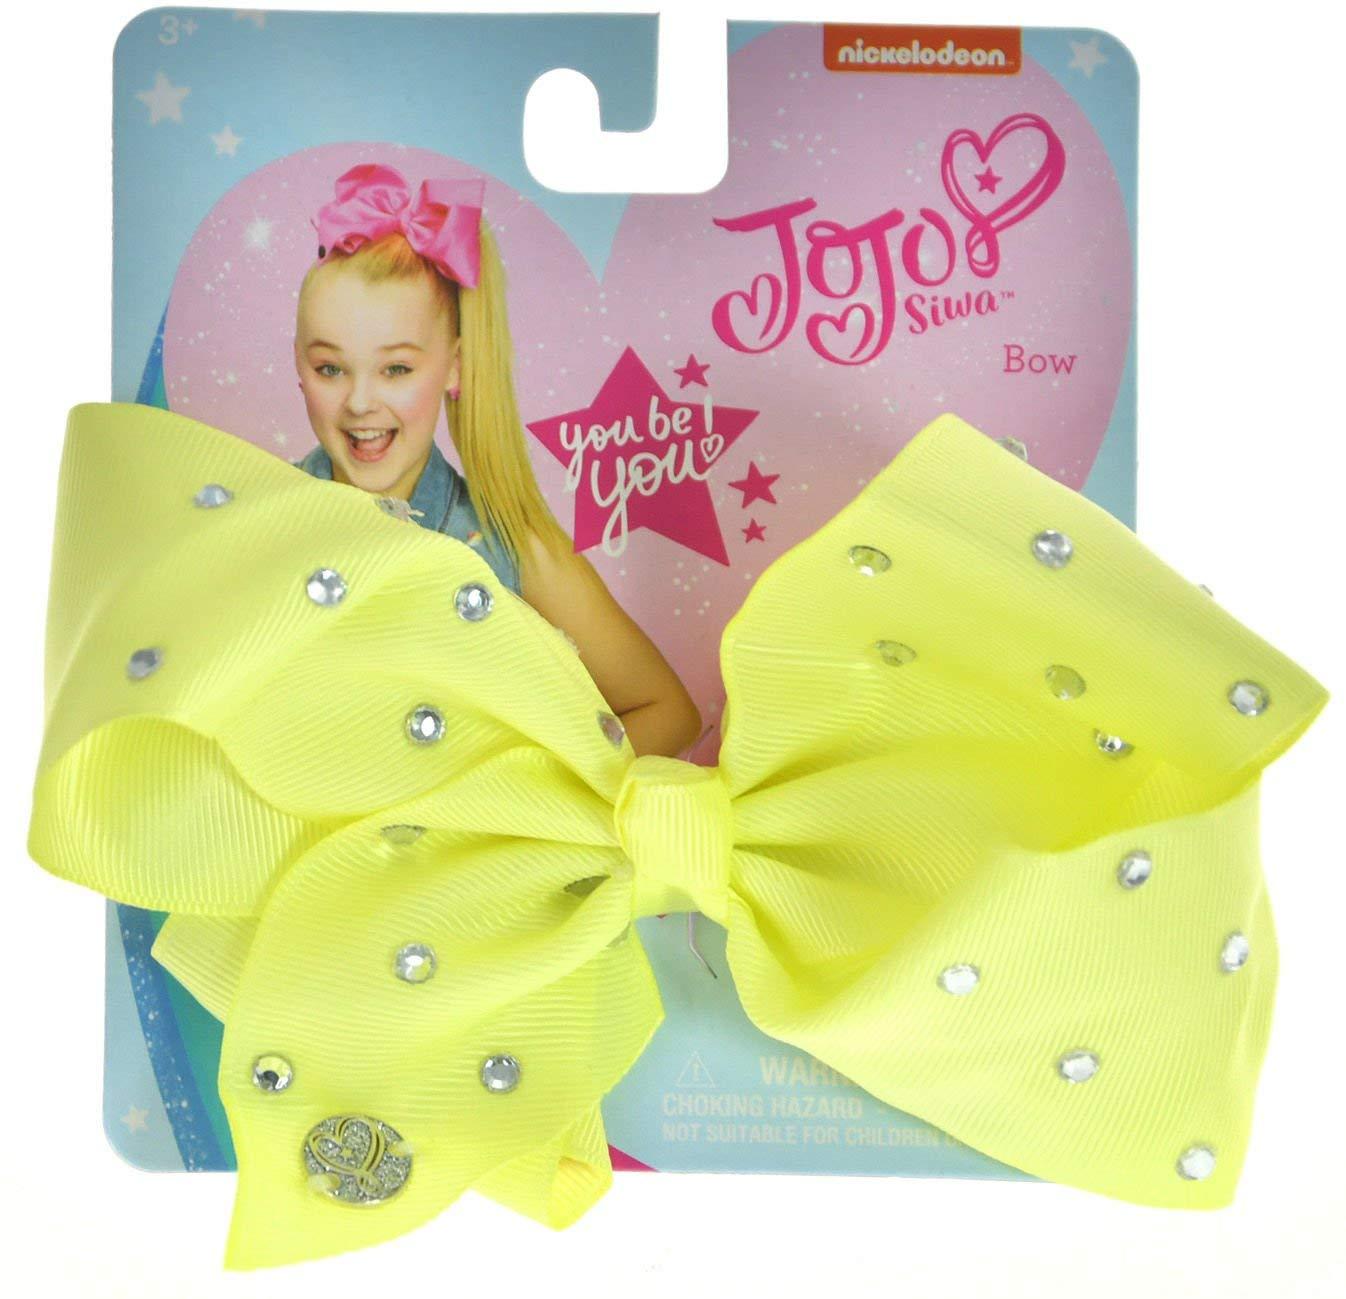 JoJo Girls Siwa Signature Collection Yellow w/Rhinestone Hair Bow